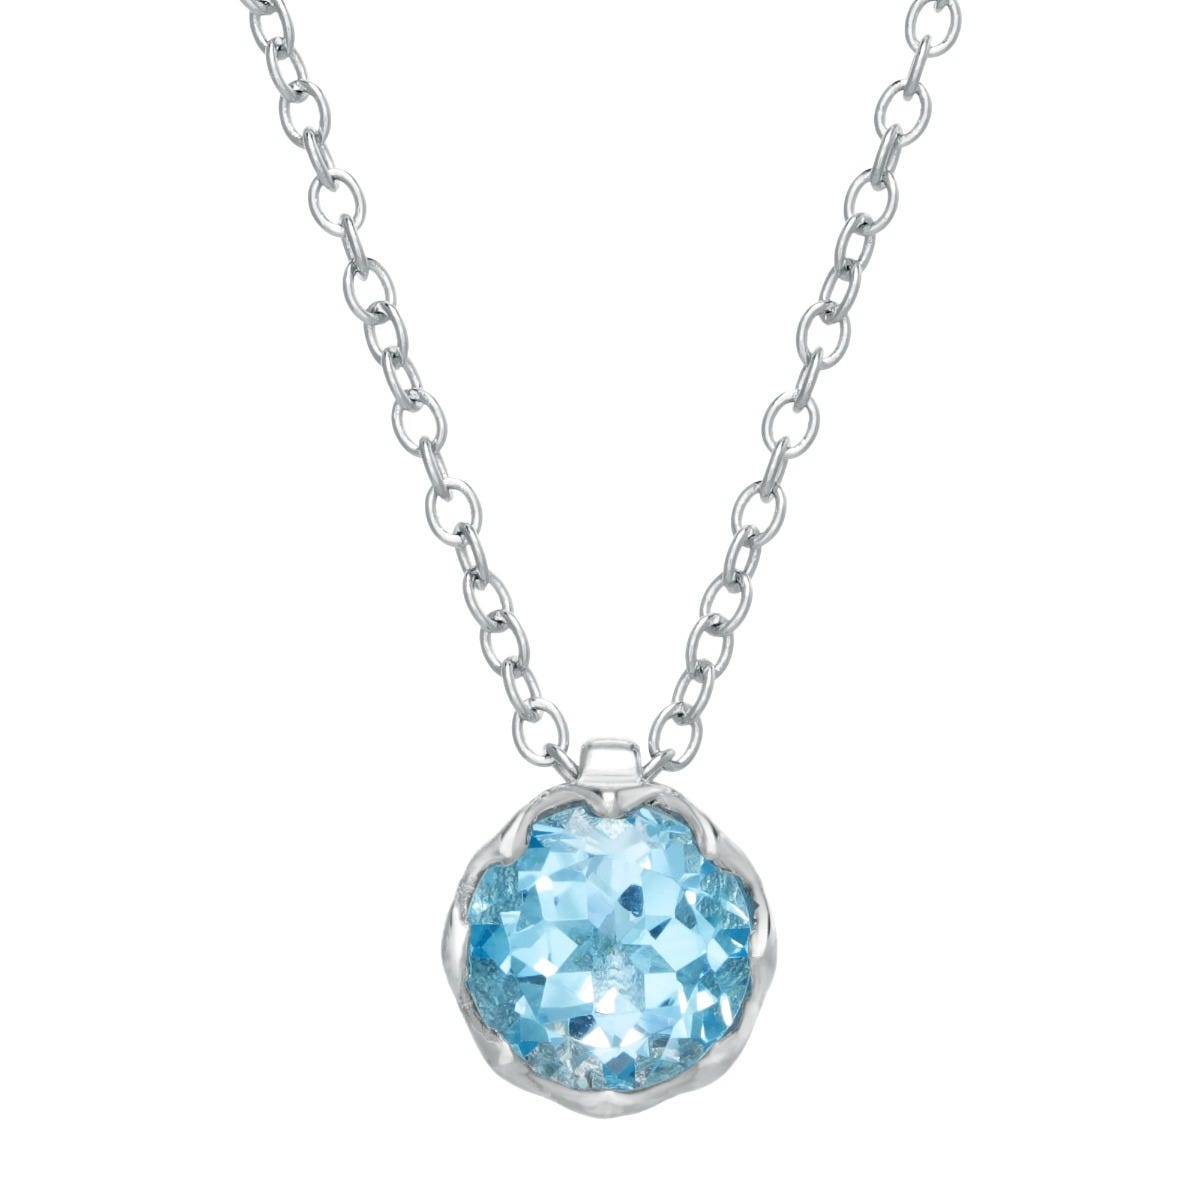 Round Blue Topaz Gemstone Pendant in Sterling Silver